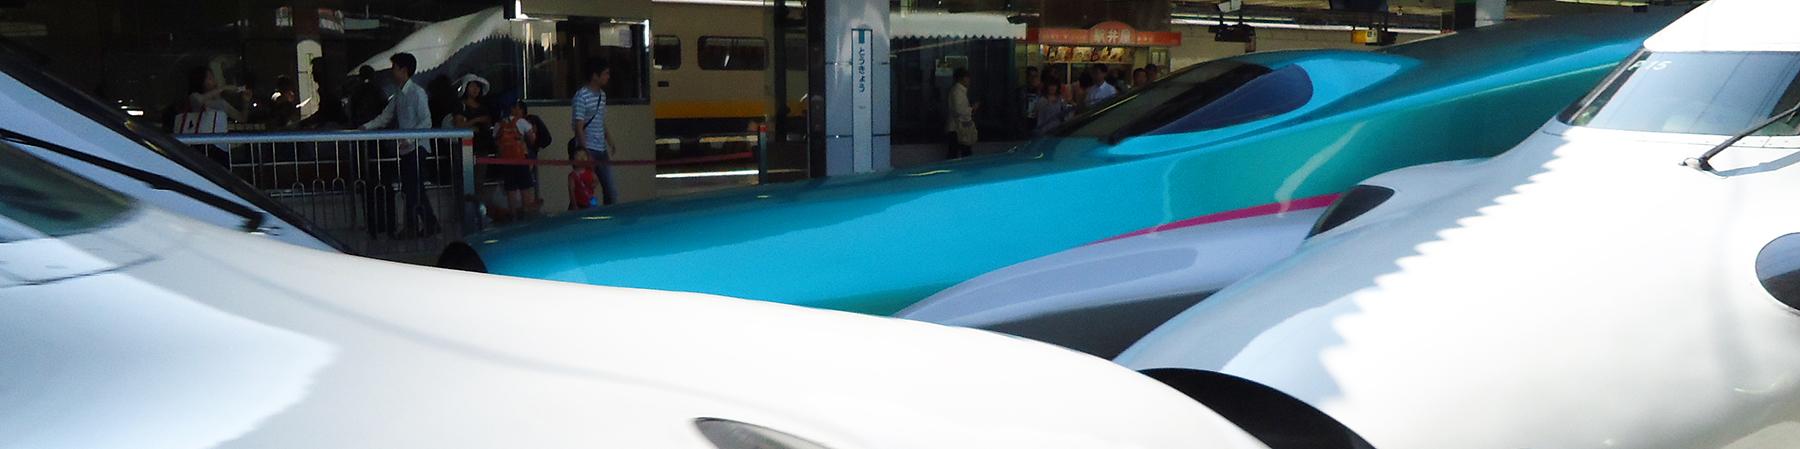 http://moritetsu.info/train/img/DSC04357ss.jpg